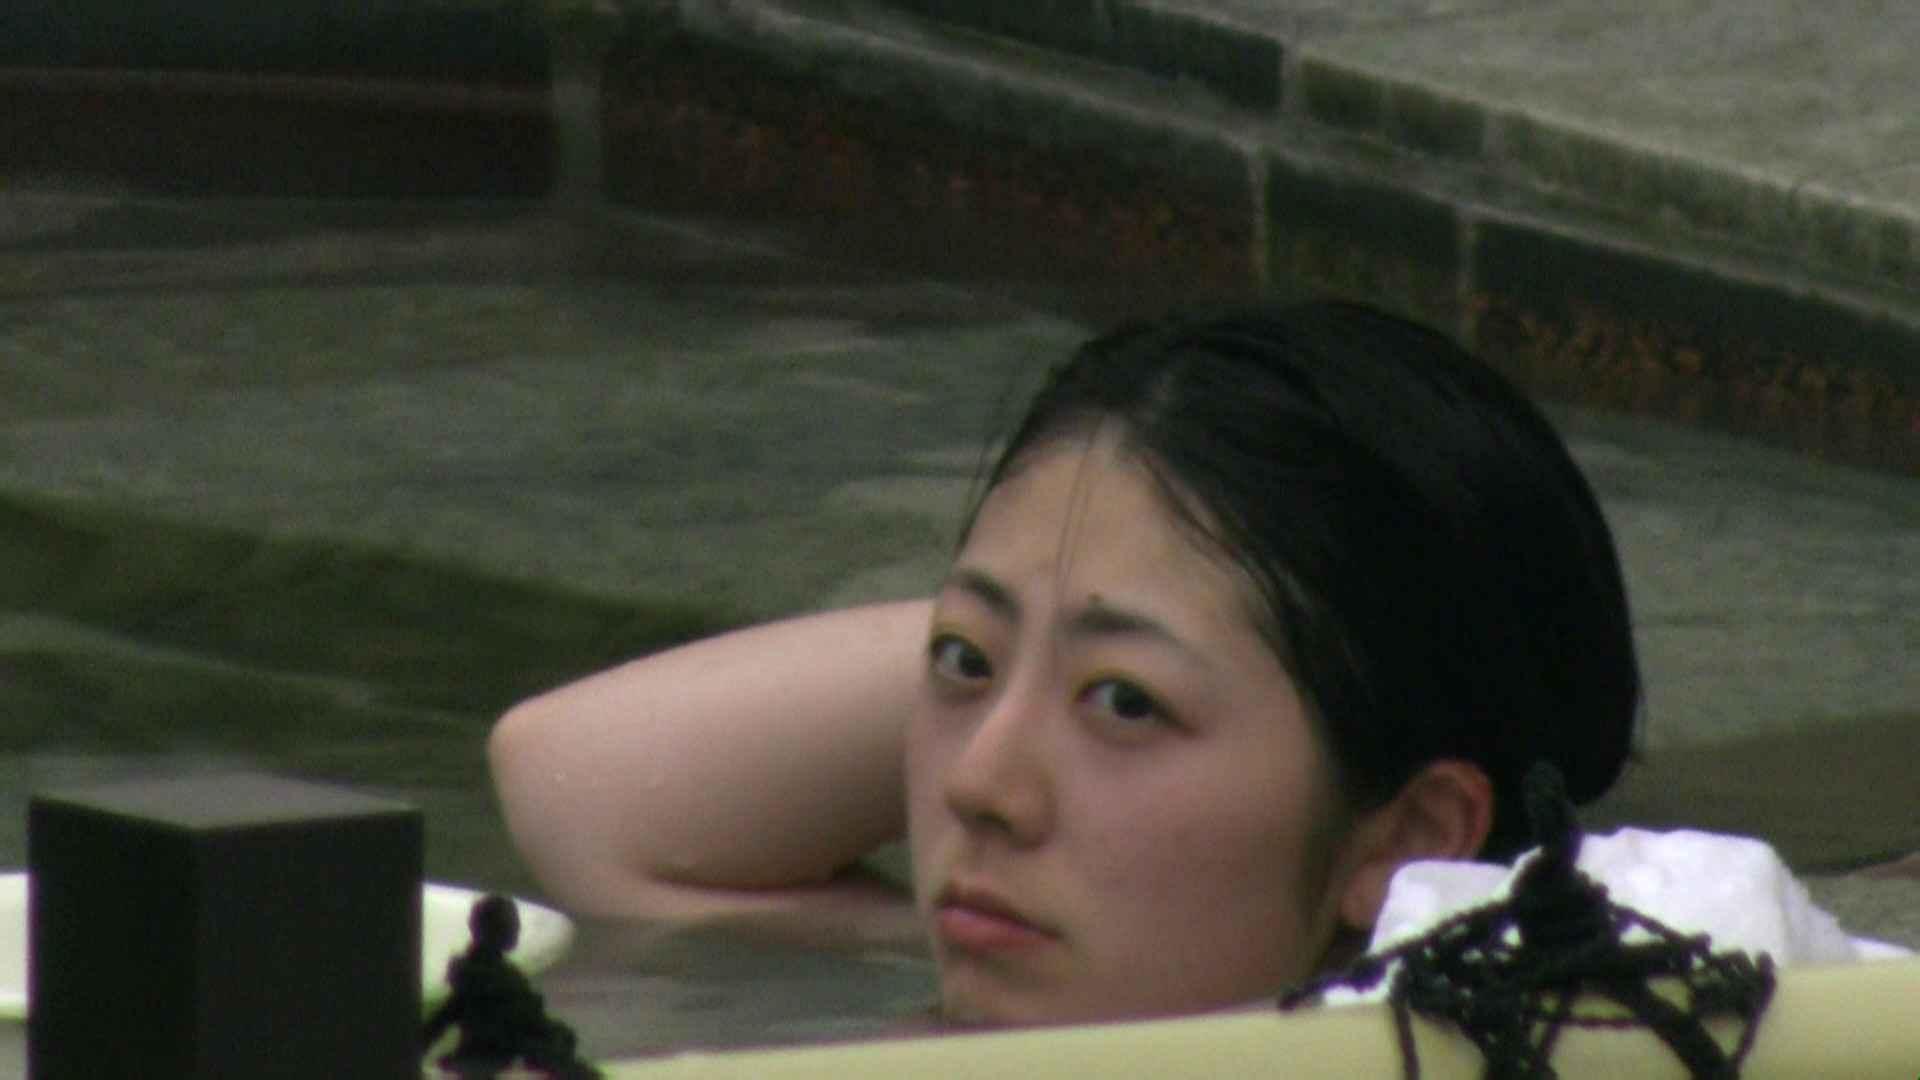 Aquaな露天風呂Vol.04 露天風呂編  94PIX 10